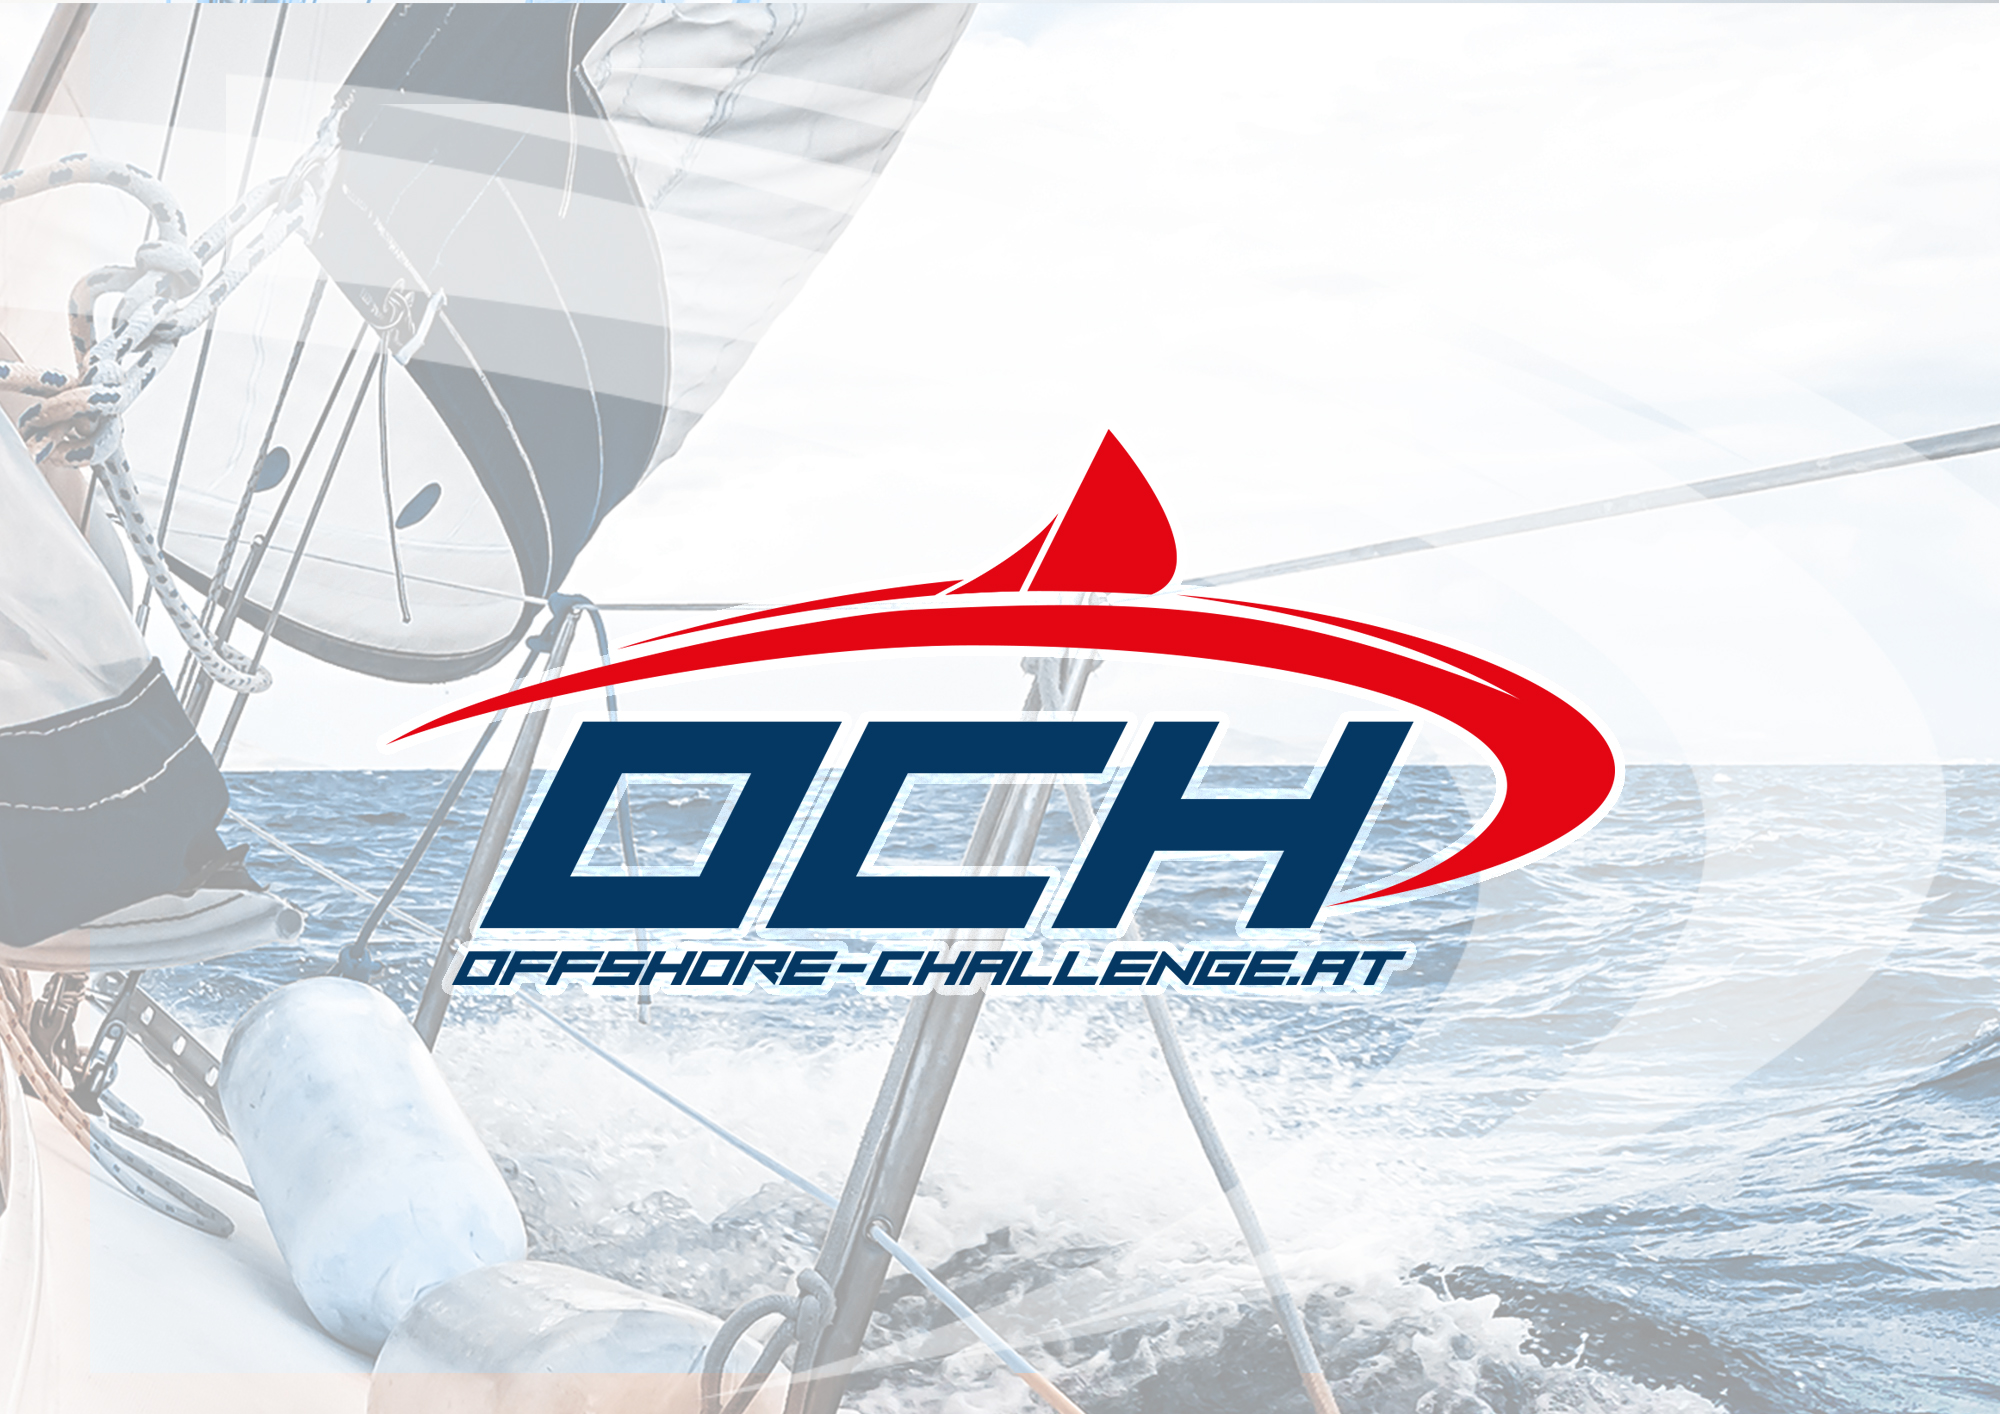 Offshore Challenge